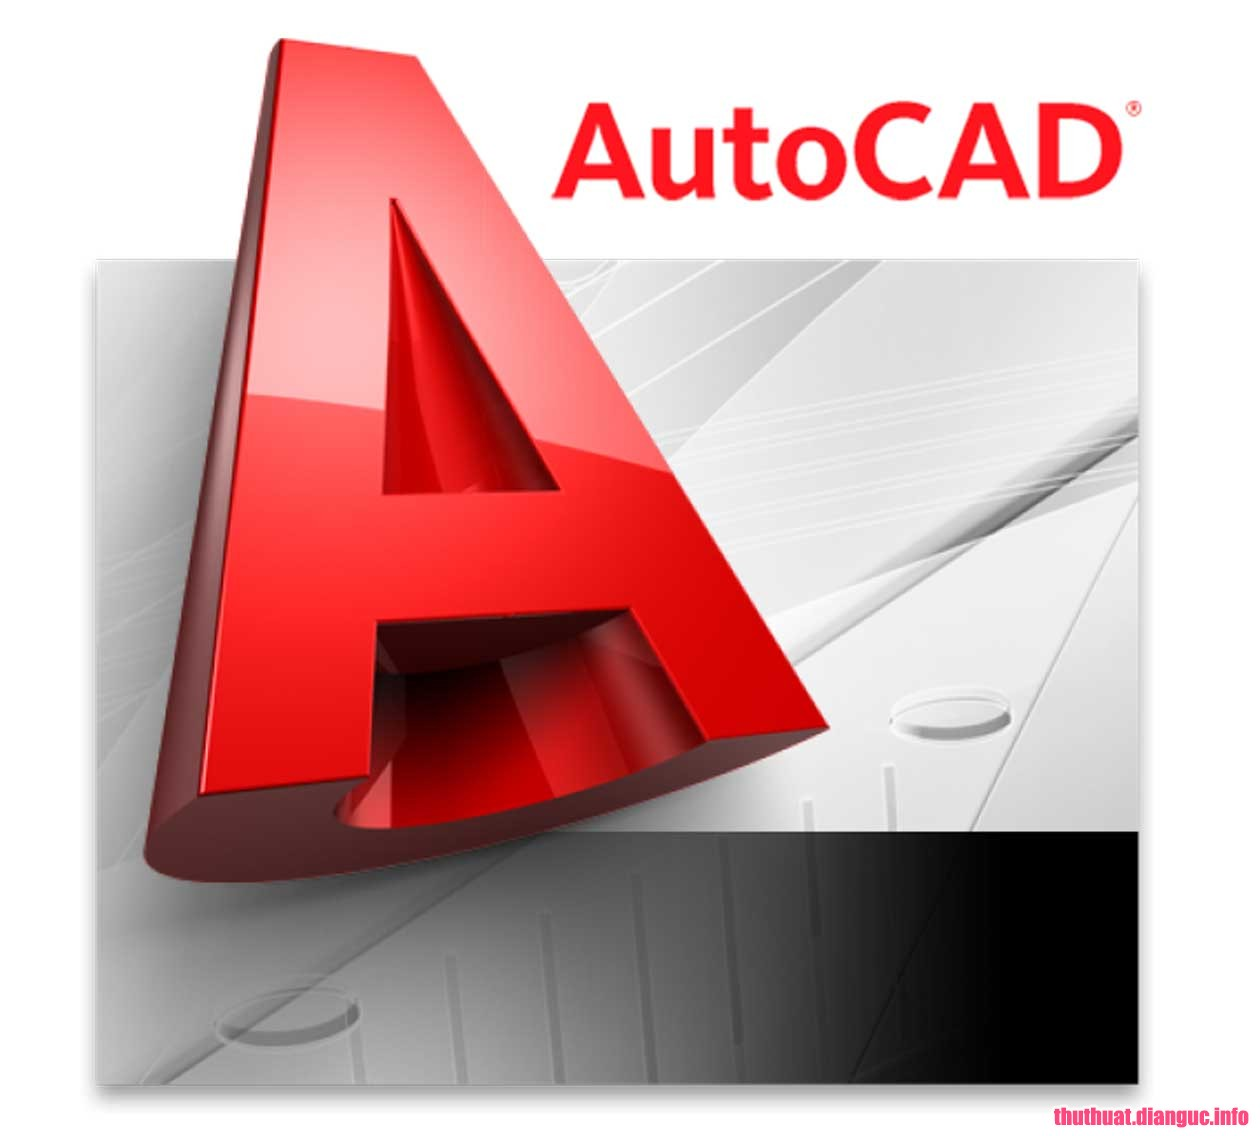 tie-mediumTổng hợp phần mềm AutoCAD tất cả các phiên bản full activate